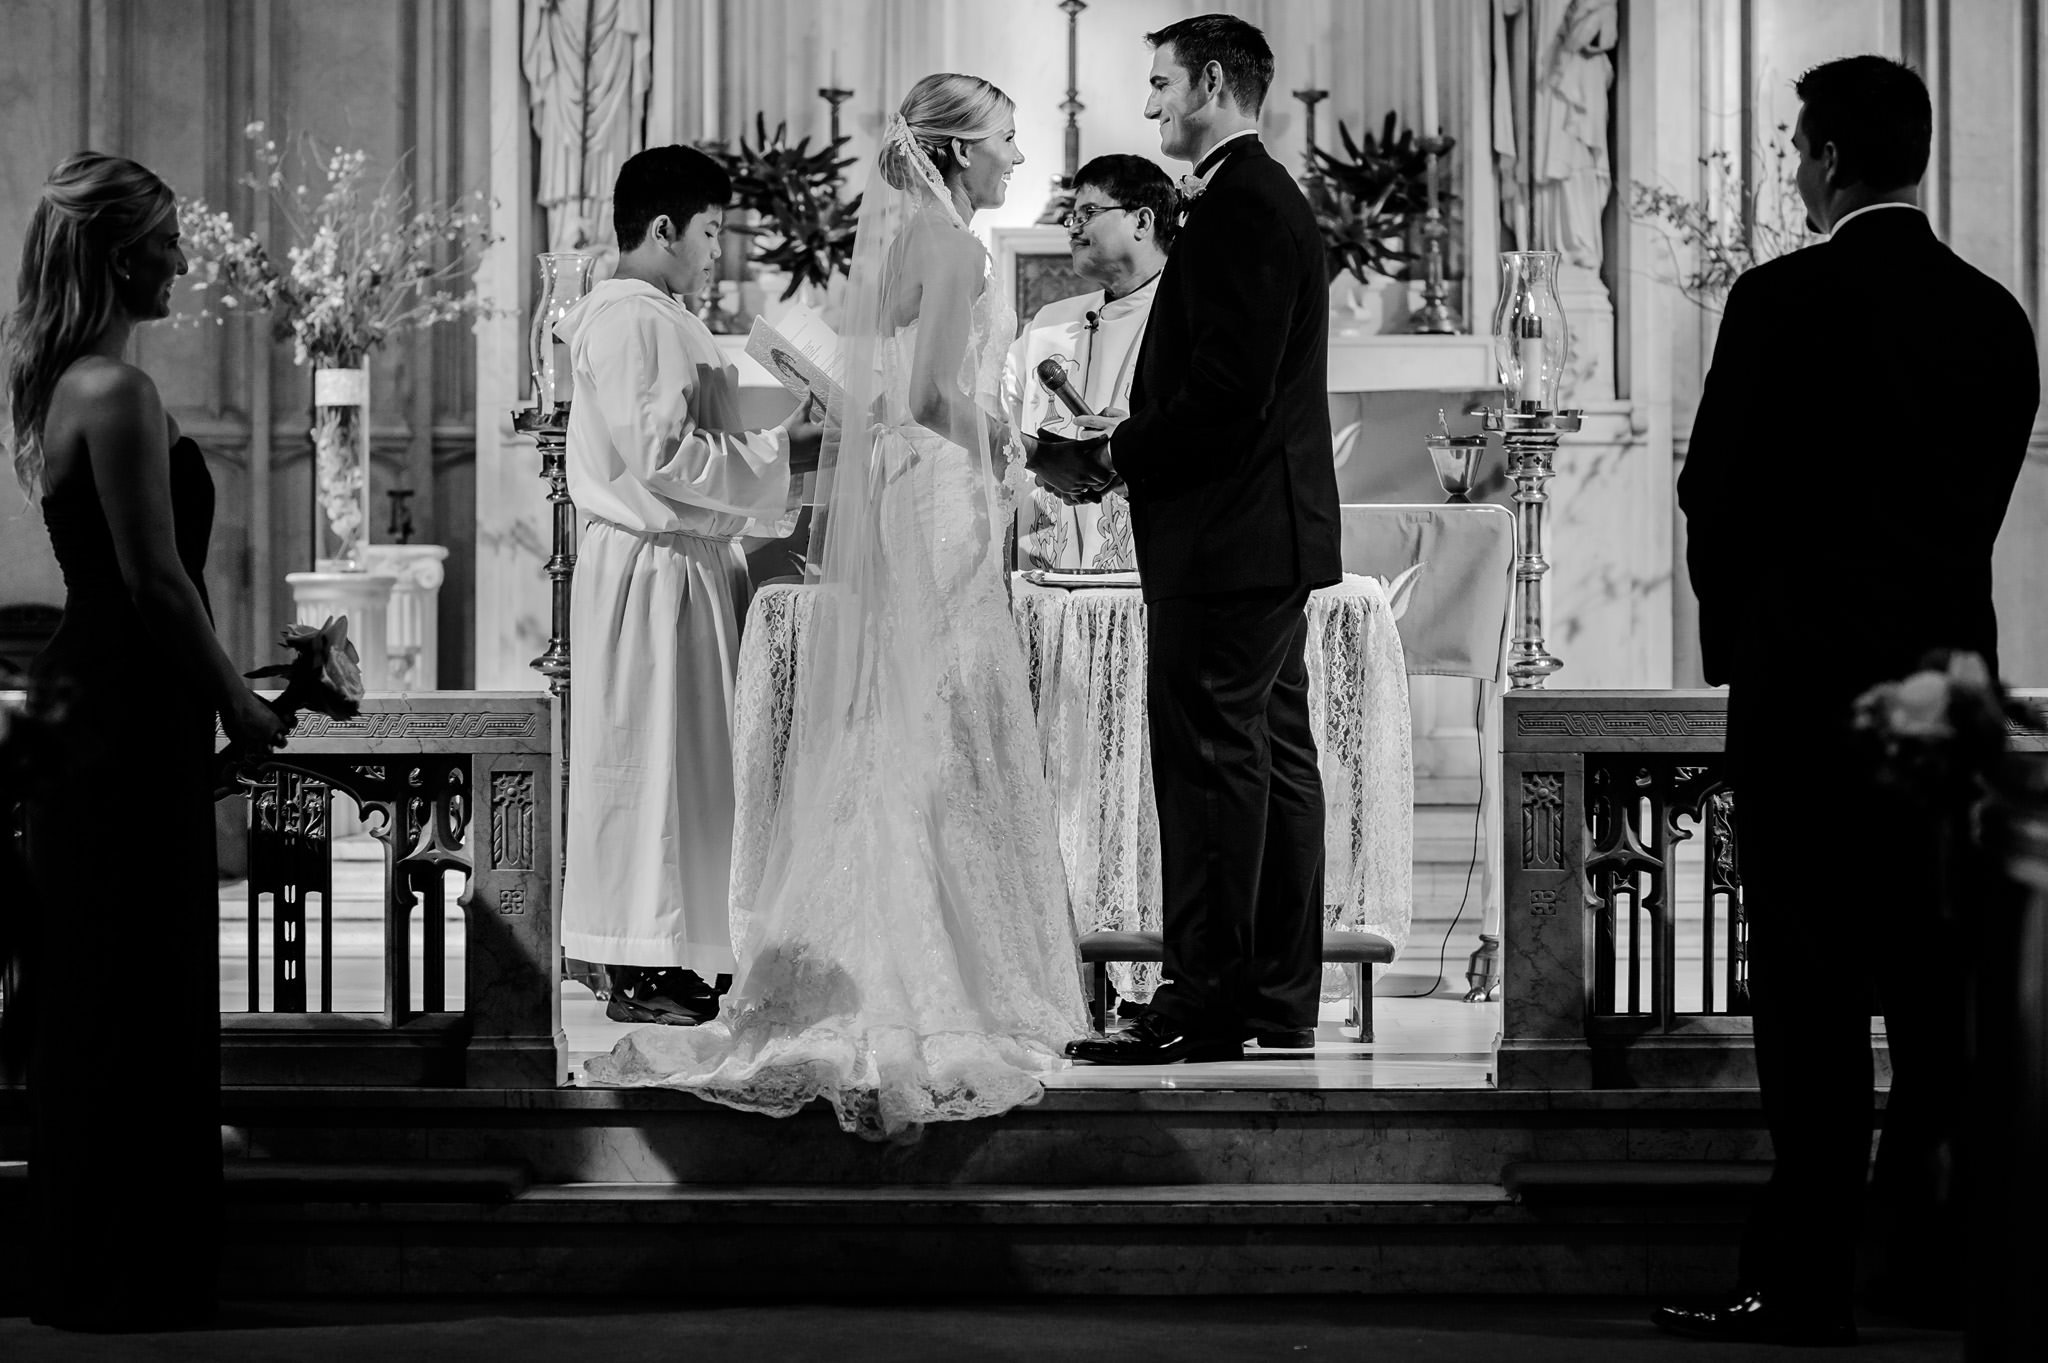 12-20140913-ShannonDan-Spradling-wed